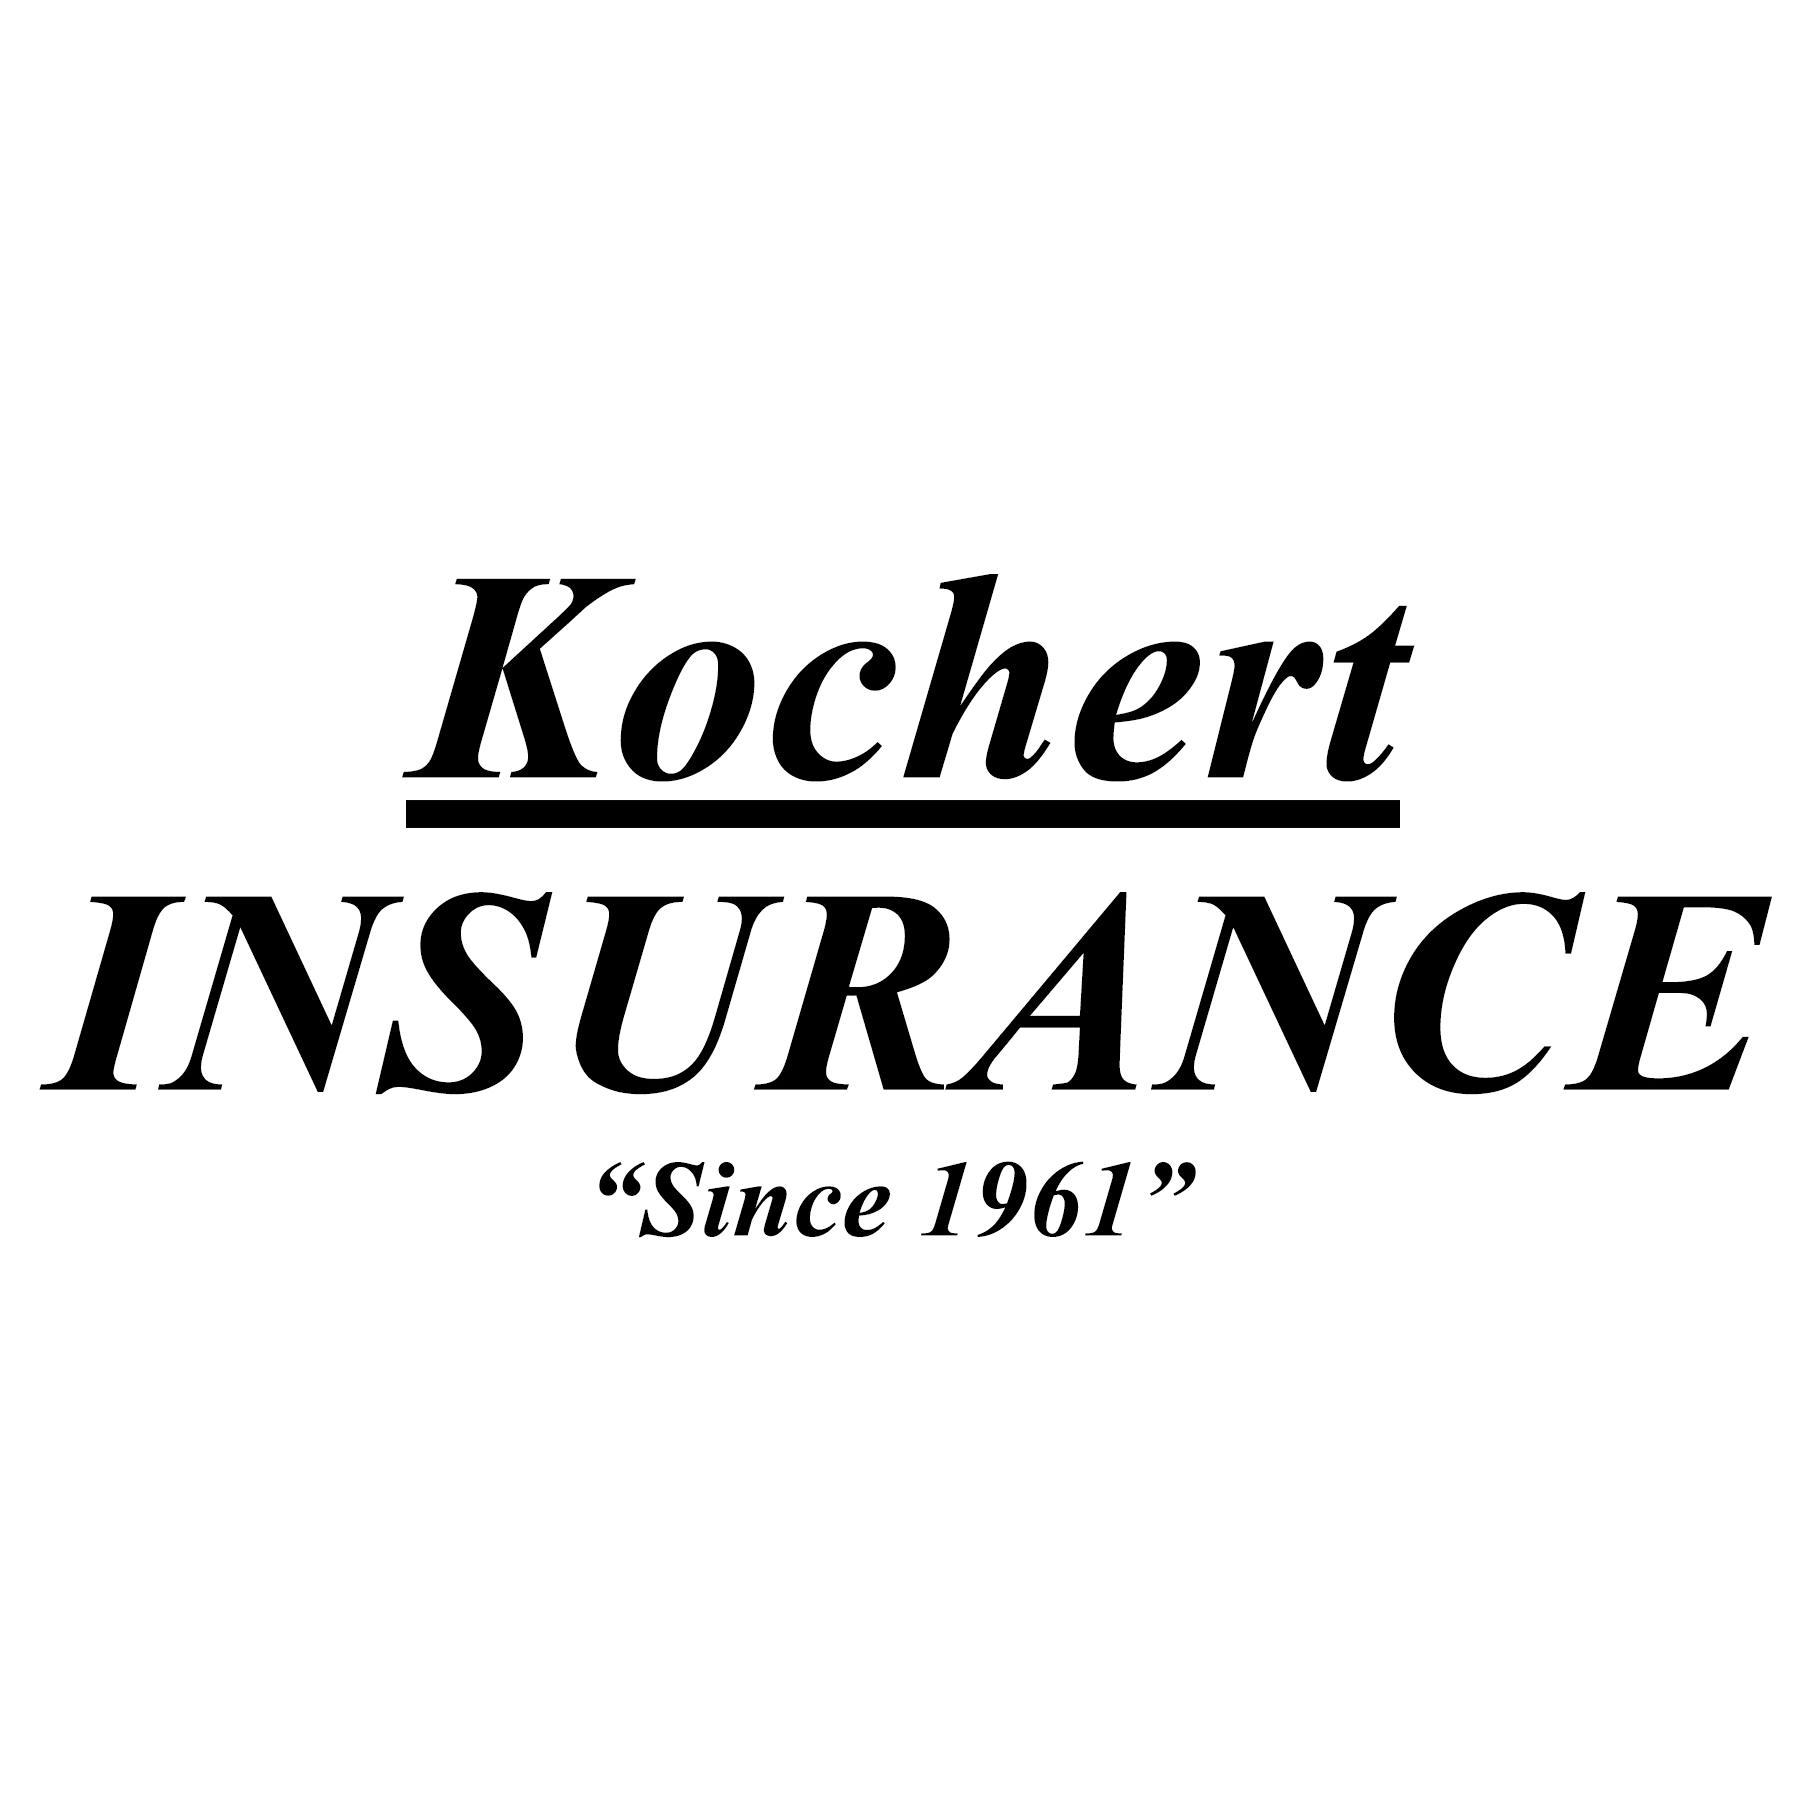 Kochert Insurance